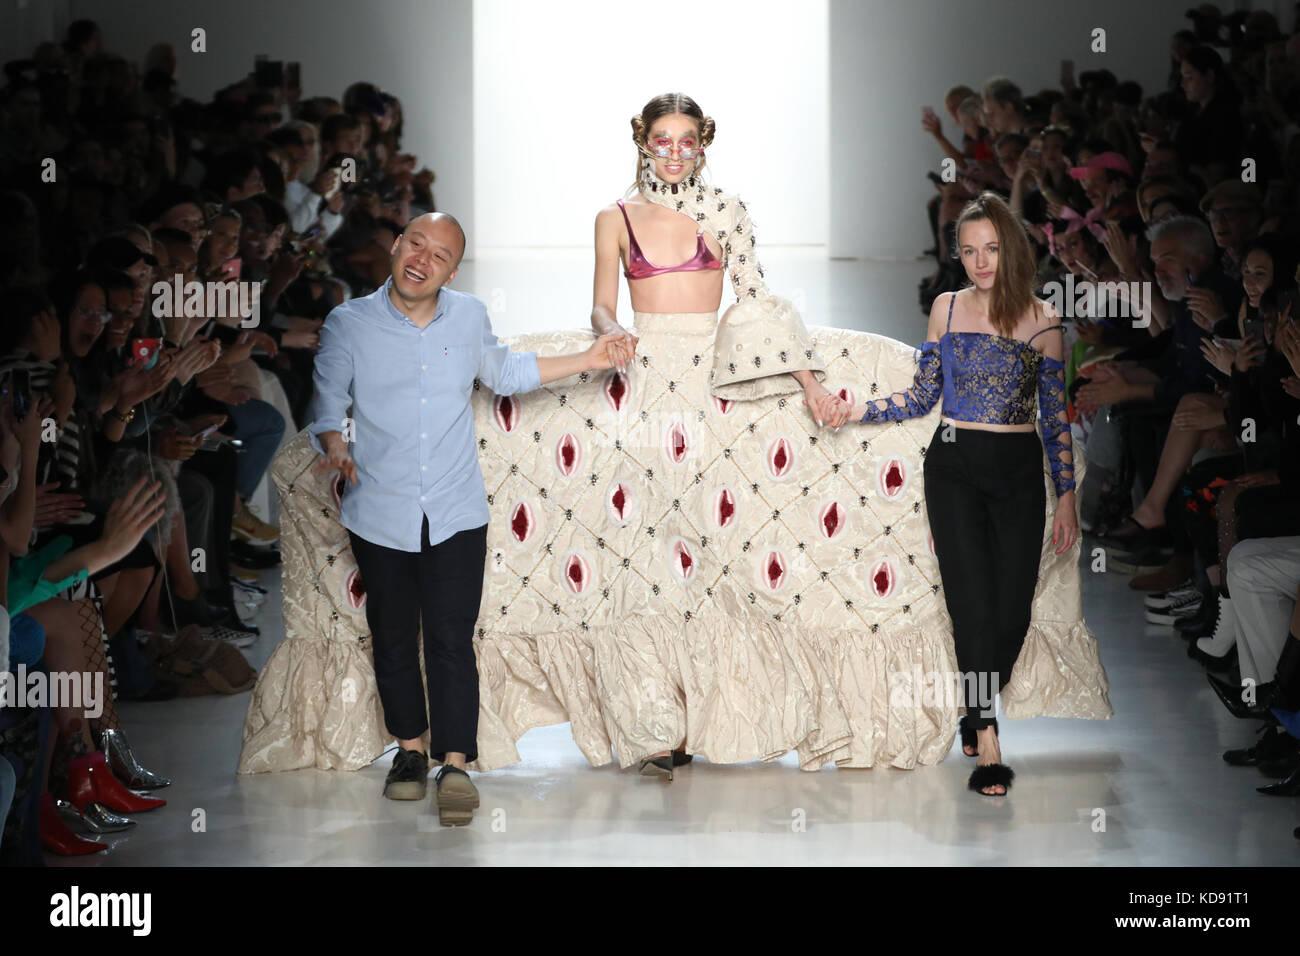 New York Fashion Week S S 2018 Namilia Runway Featuring Namilia Stock Photo 163082865 Alamy